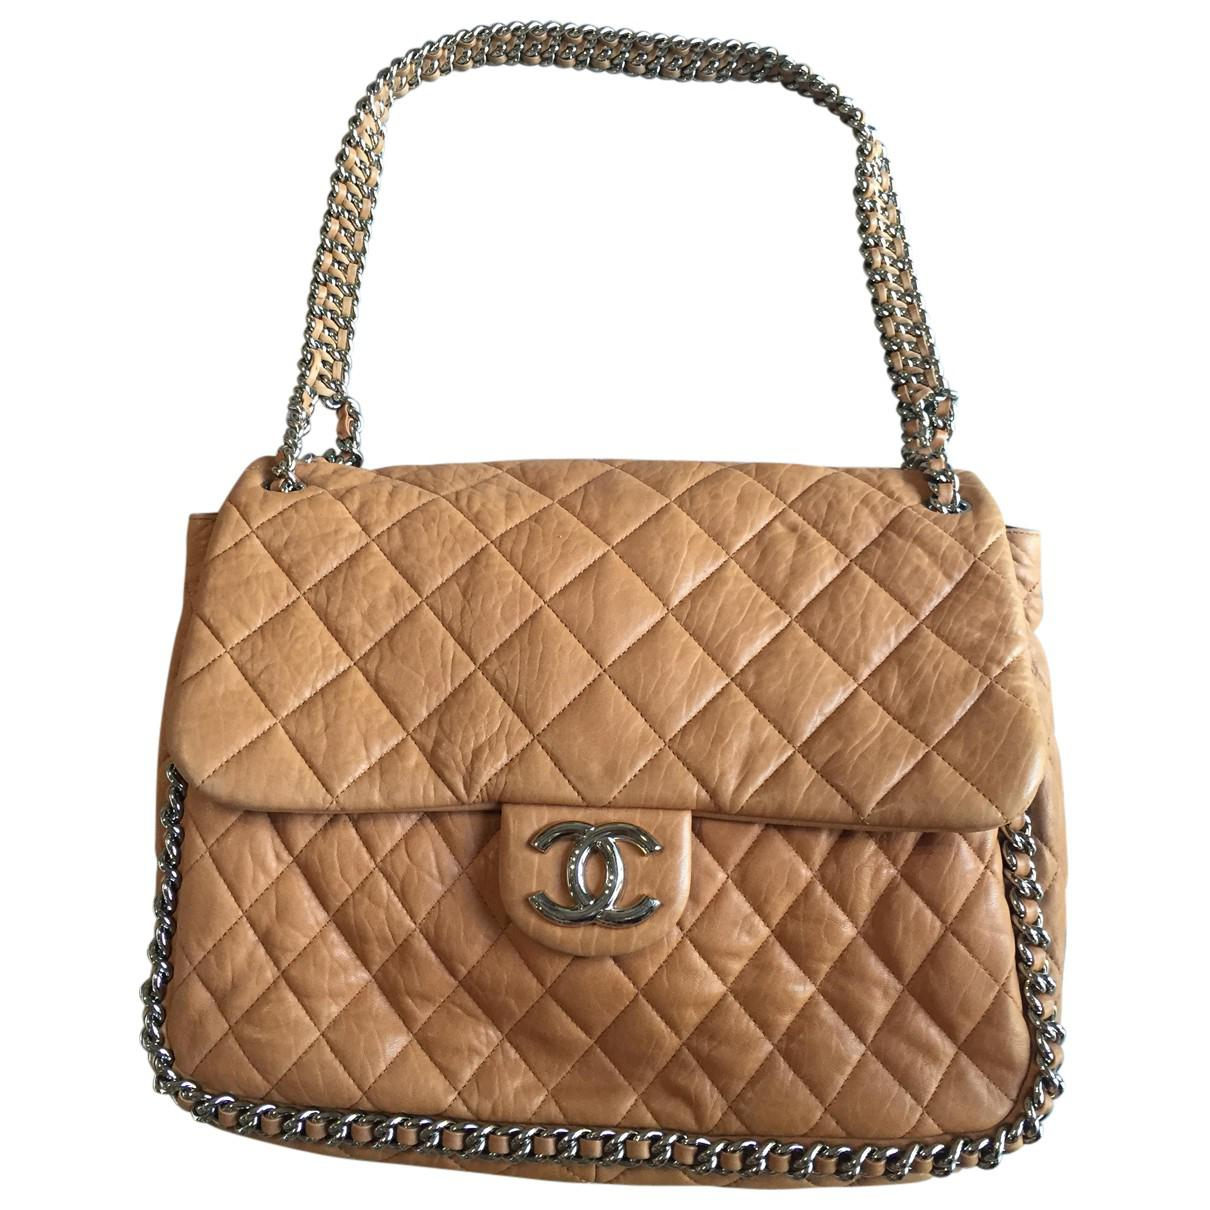 4fbef37113f8 Lyst - Sac à main Timeless en cuir Chanel en coloris Marron